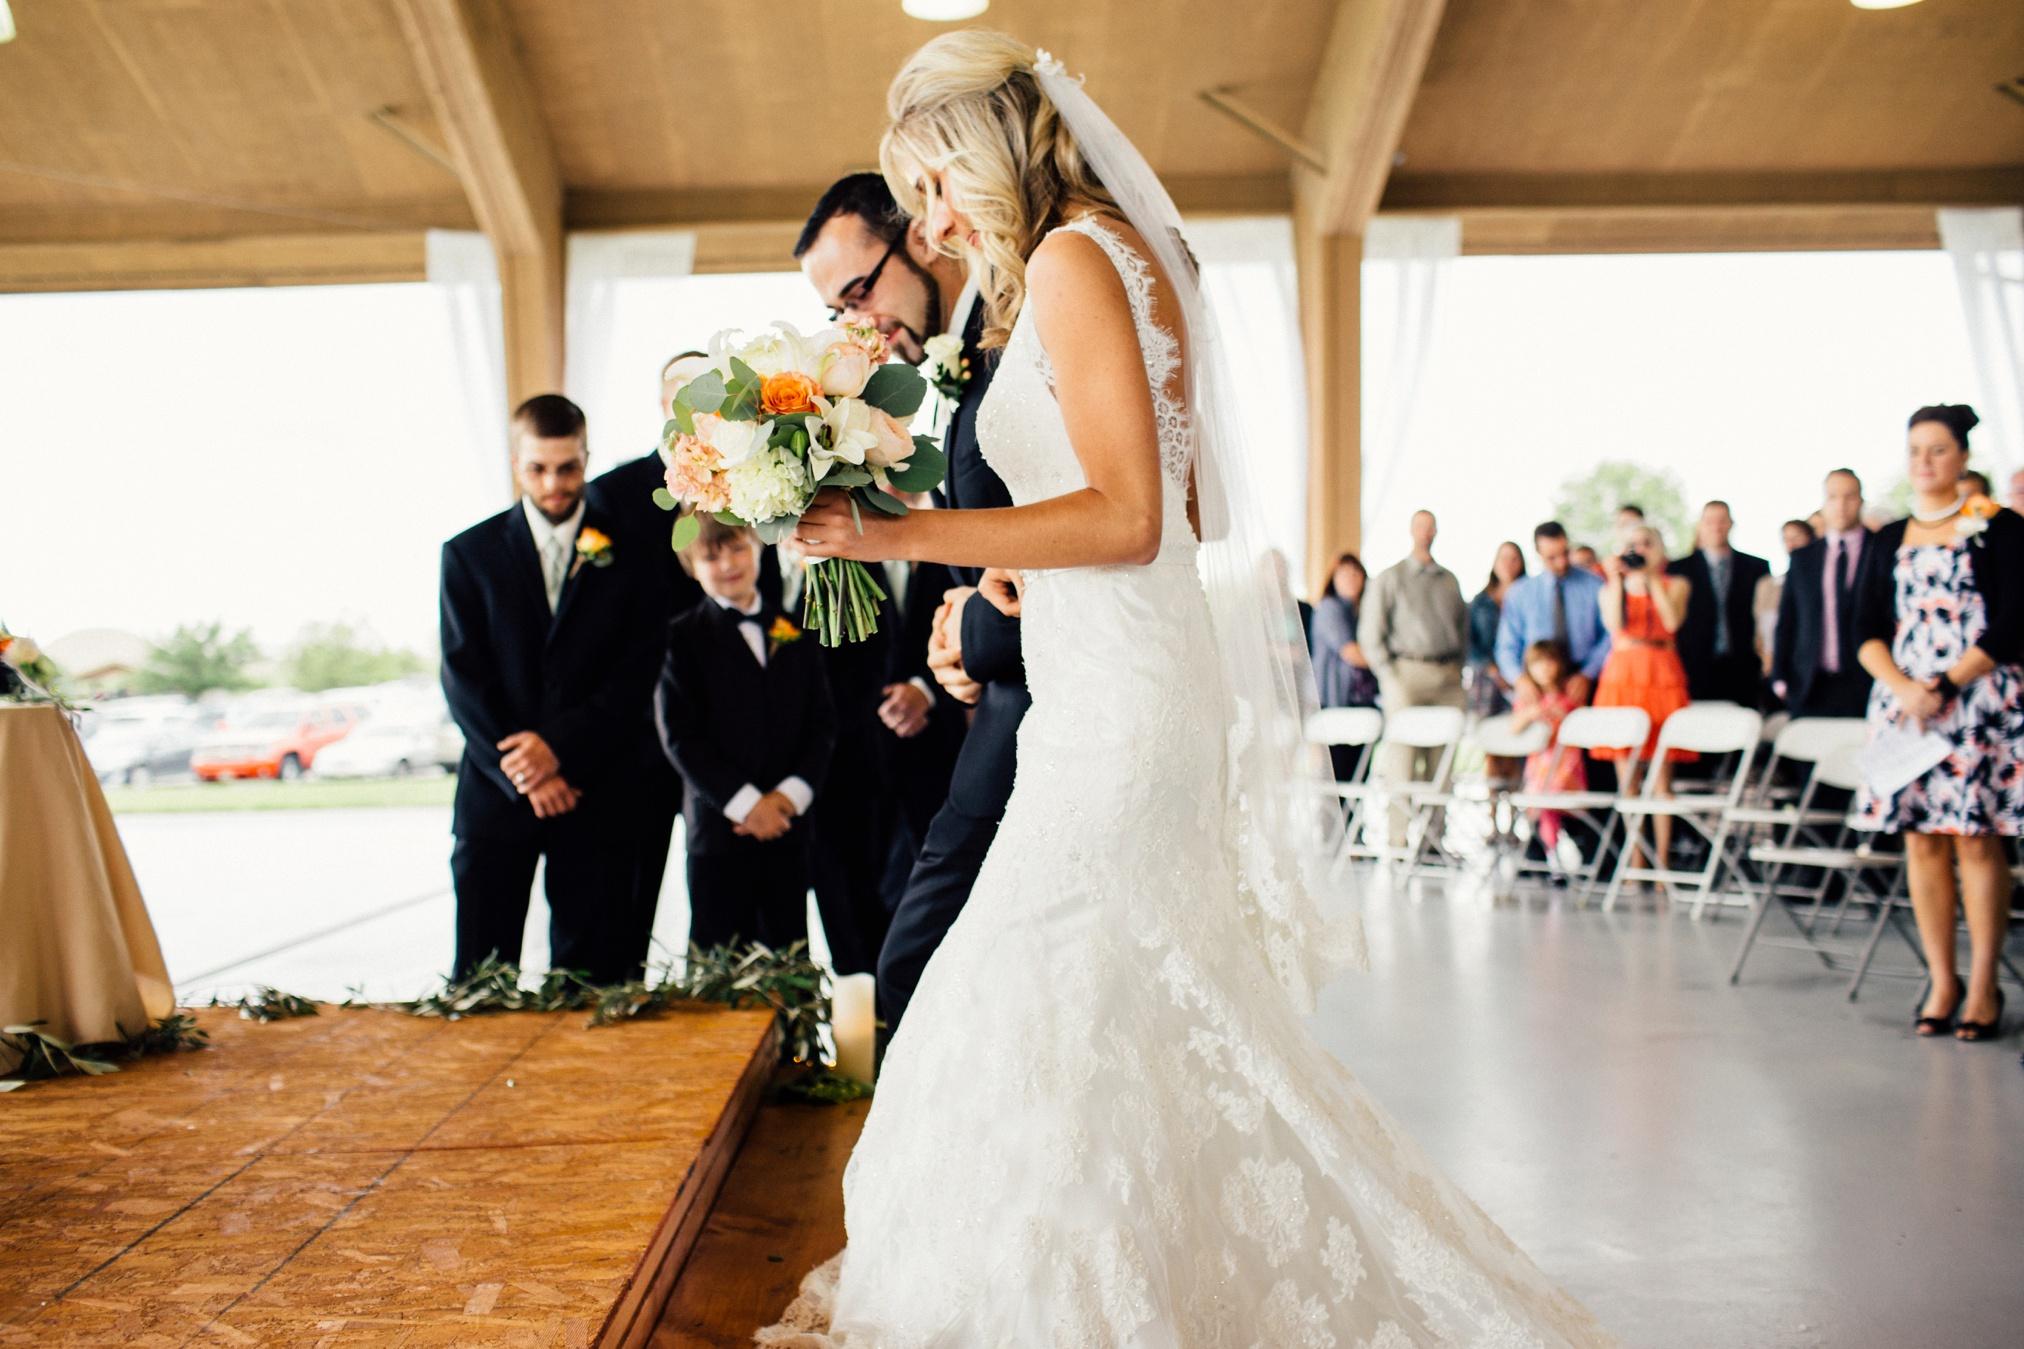 schmid_wedding-404.jpg